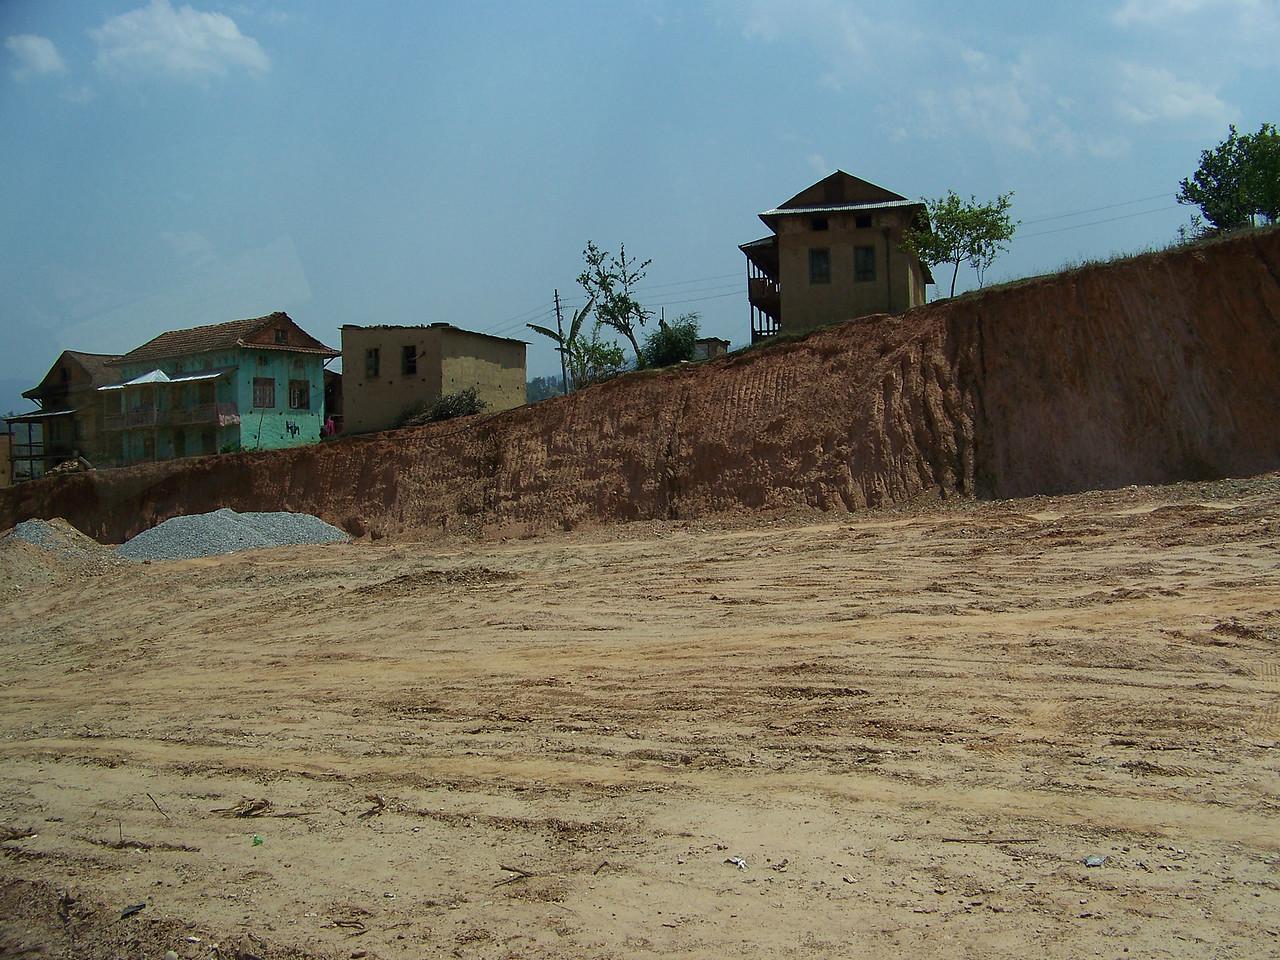 0667 - Scenery along Araniko Highway in Nepal Between Kodari and Katmandu - Nepal.JPG